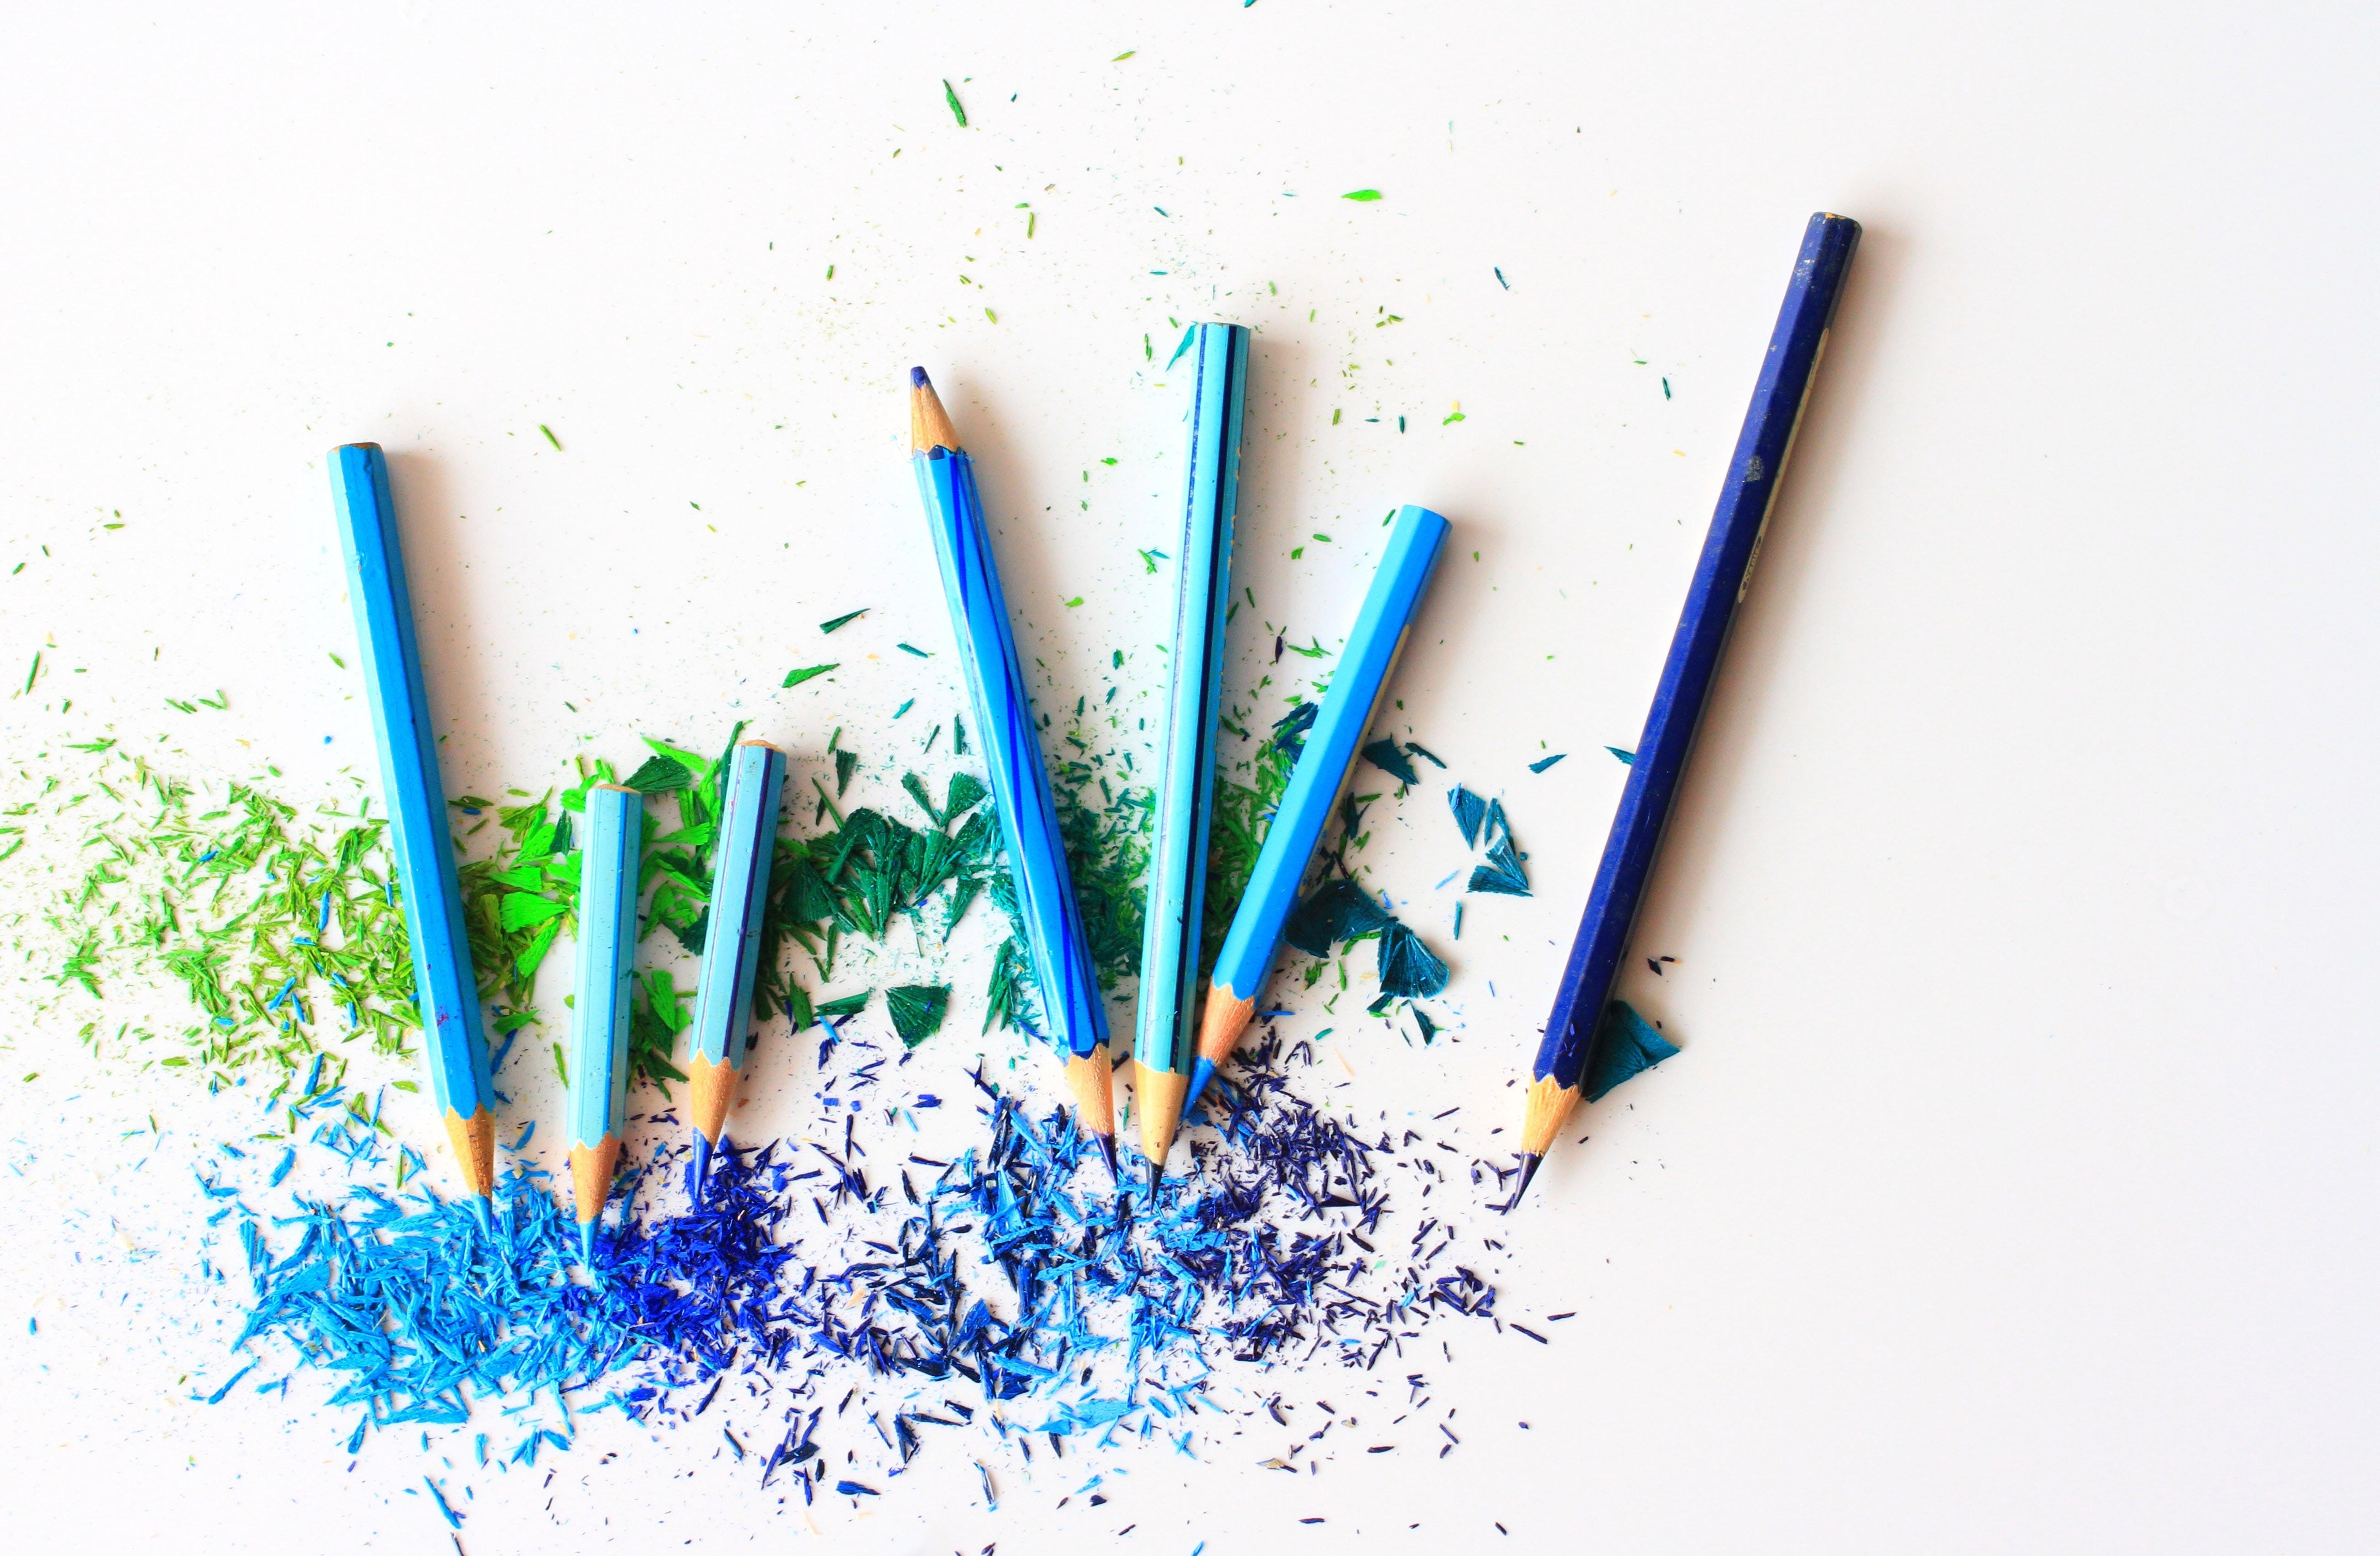 Blue and Purple Color Pencils, Art, Vibrant, Tool, Still life, HQ Photo